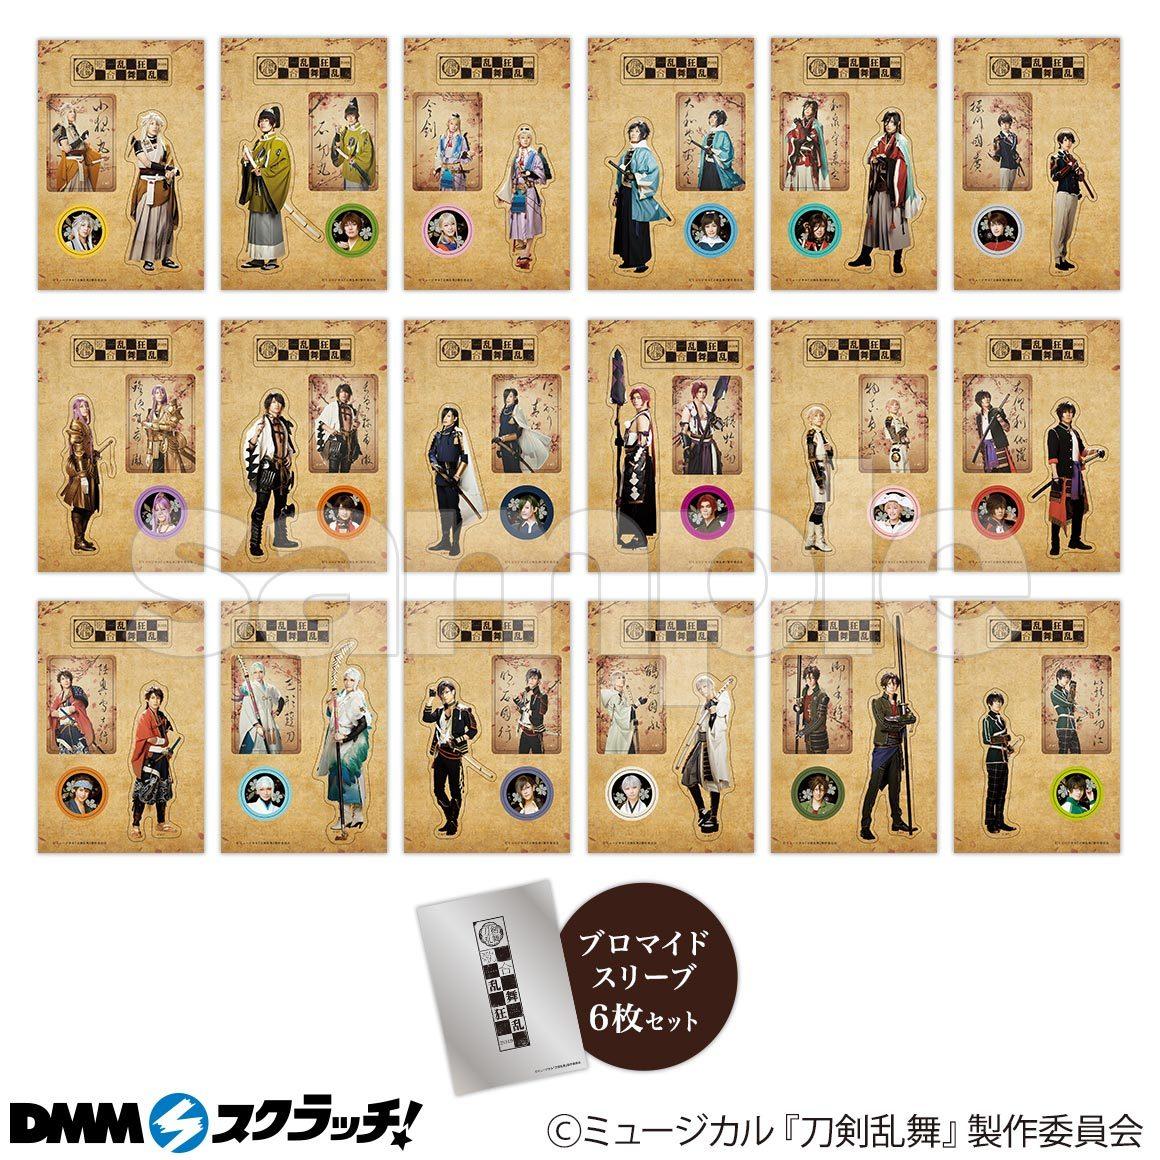 E賞  ステッカー1枚+ブロマイドスリーブ6枚セット ( 18 種)